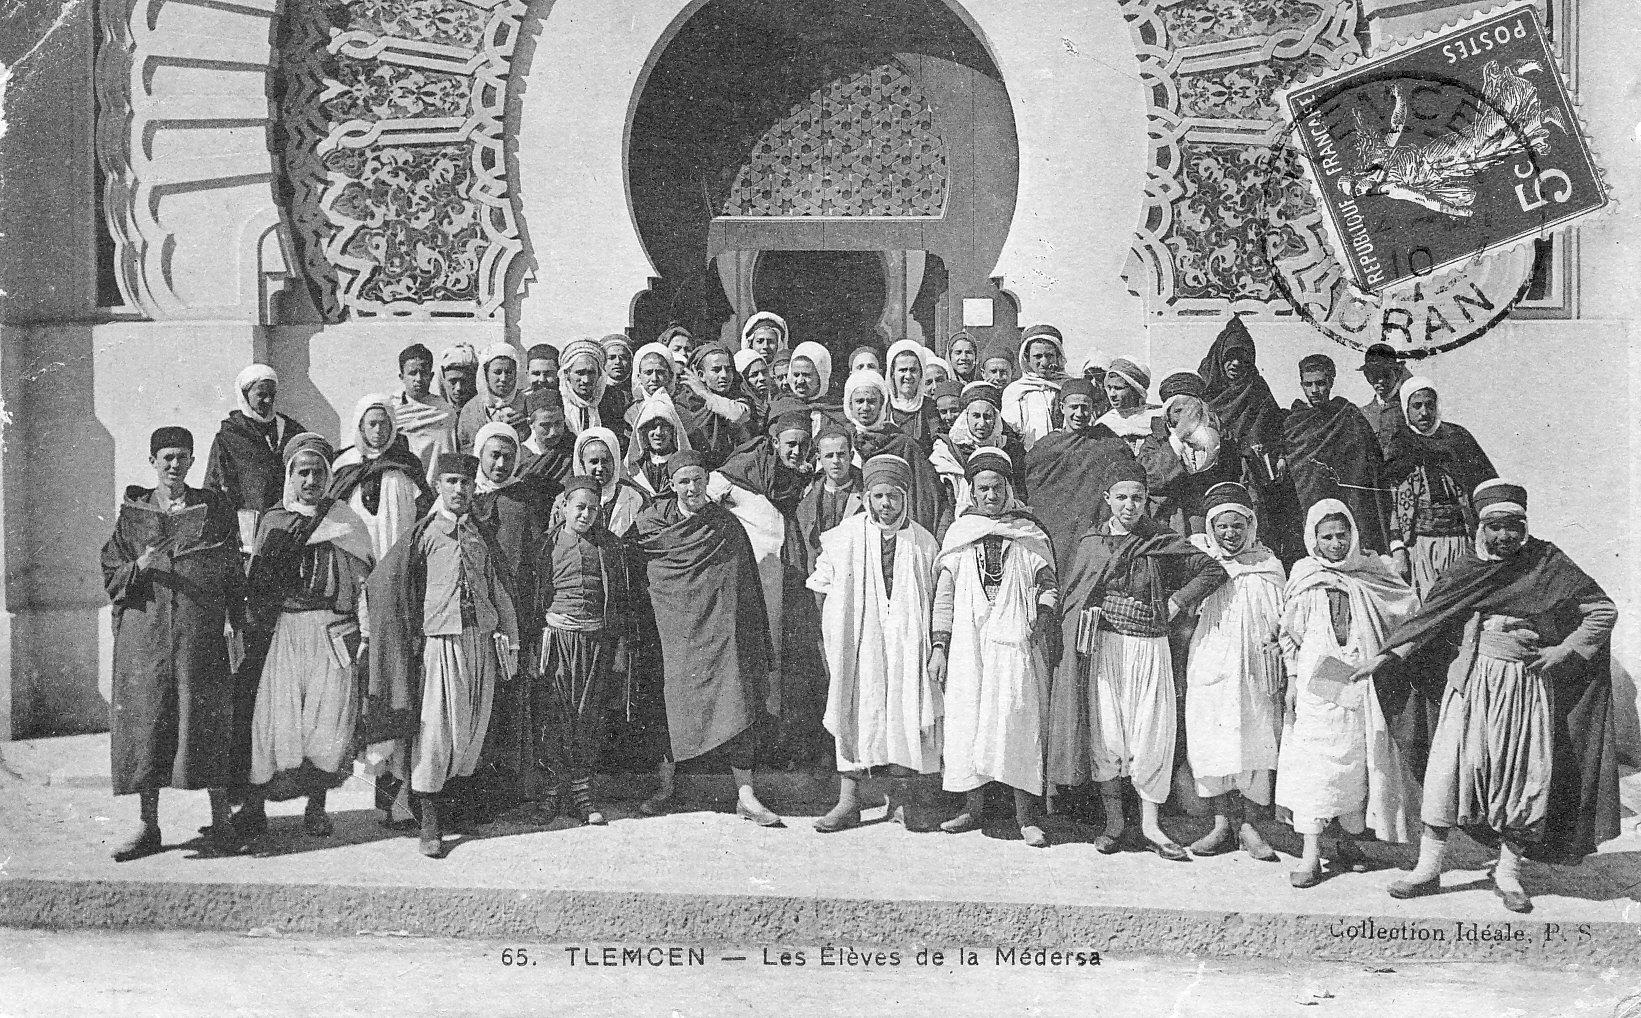 17224-tlemcen-les-eleves-de-la-medersa-1939.jpg